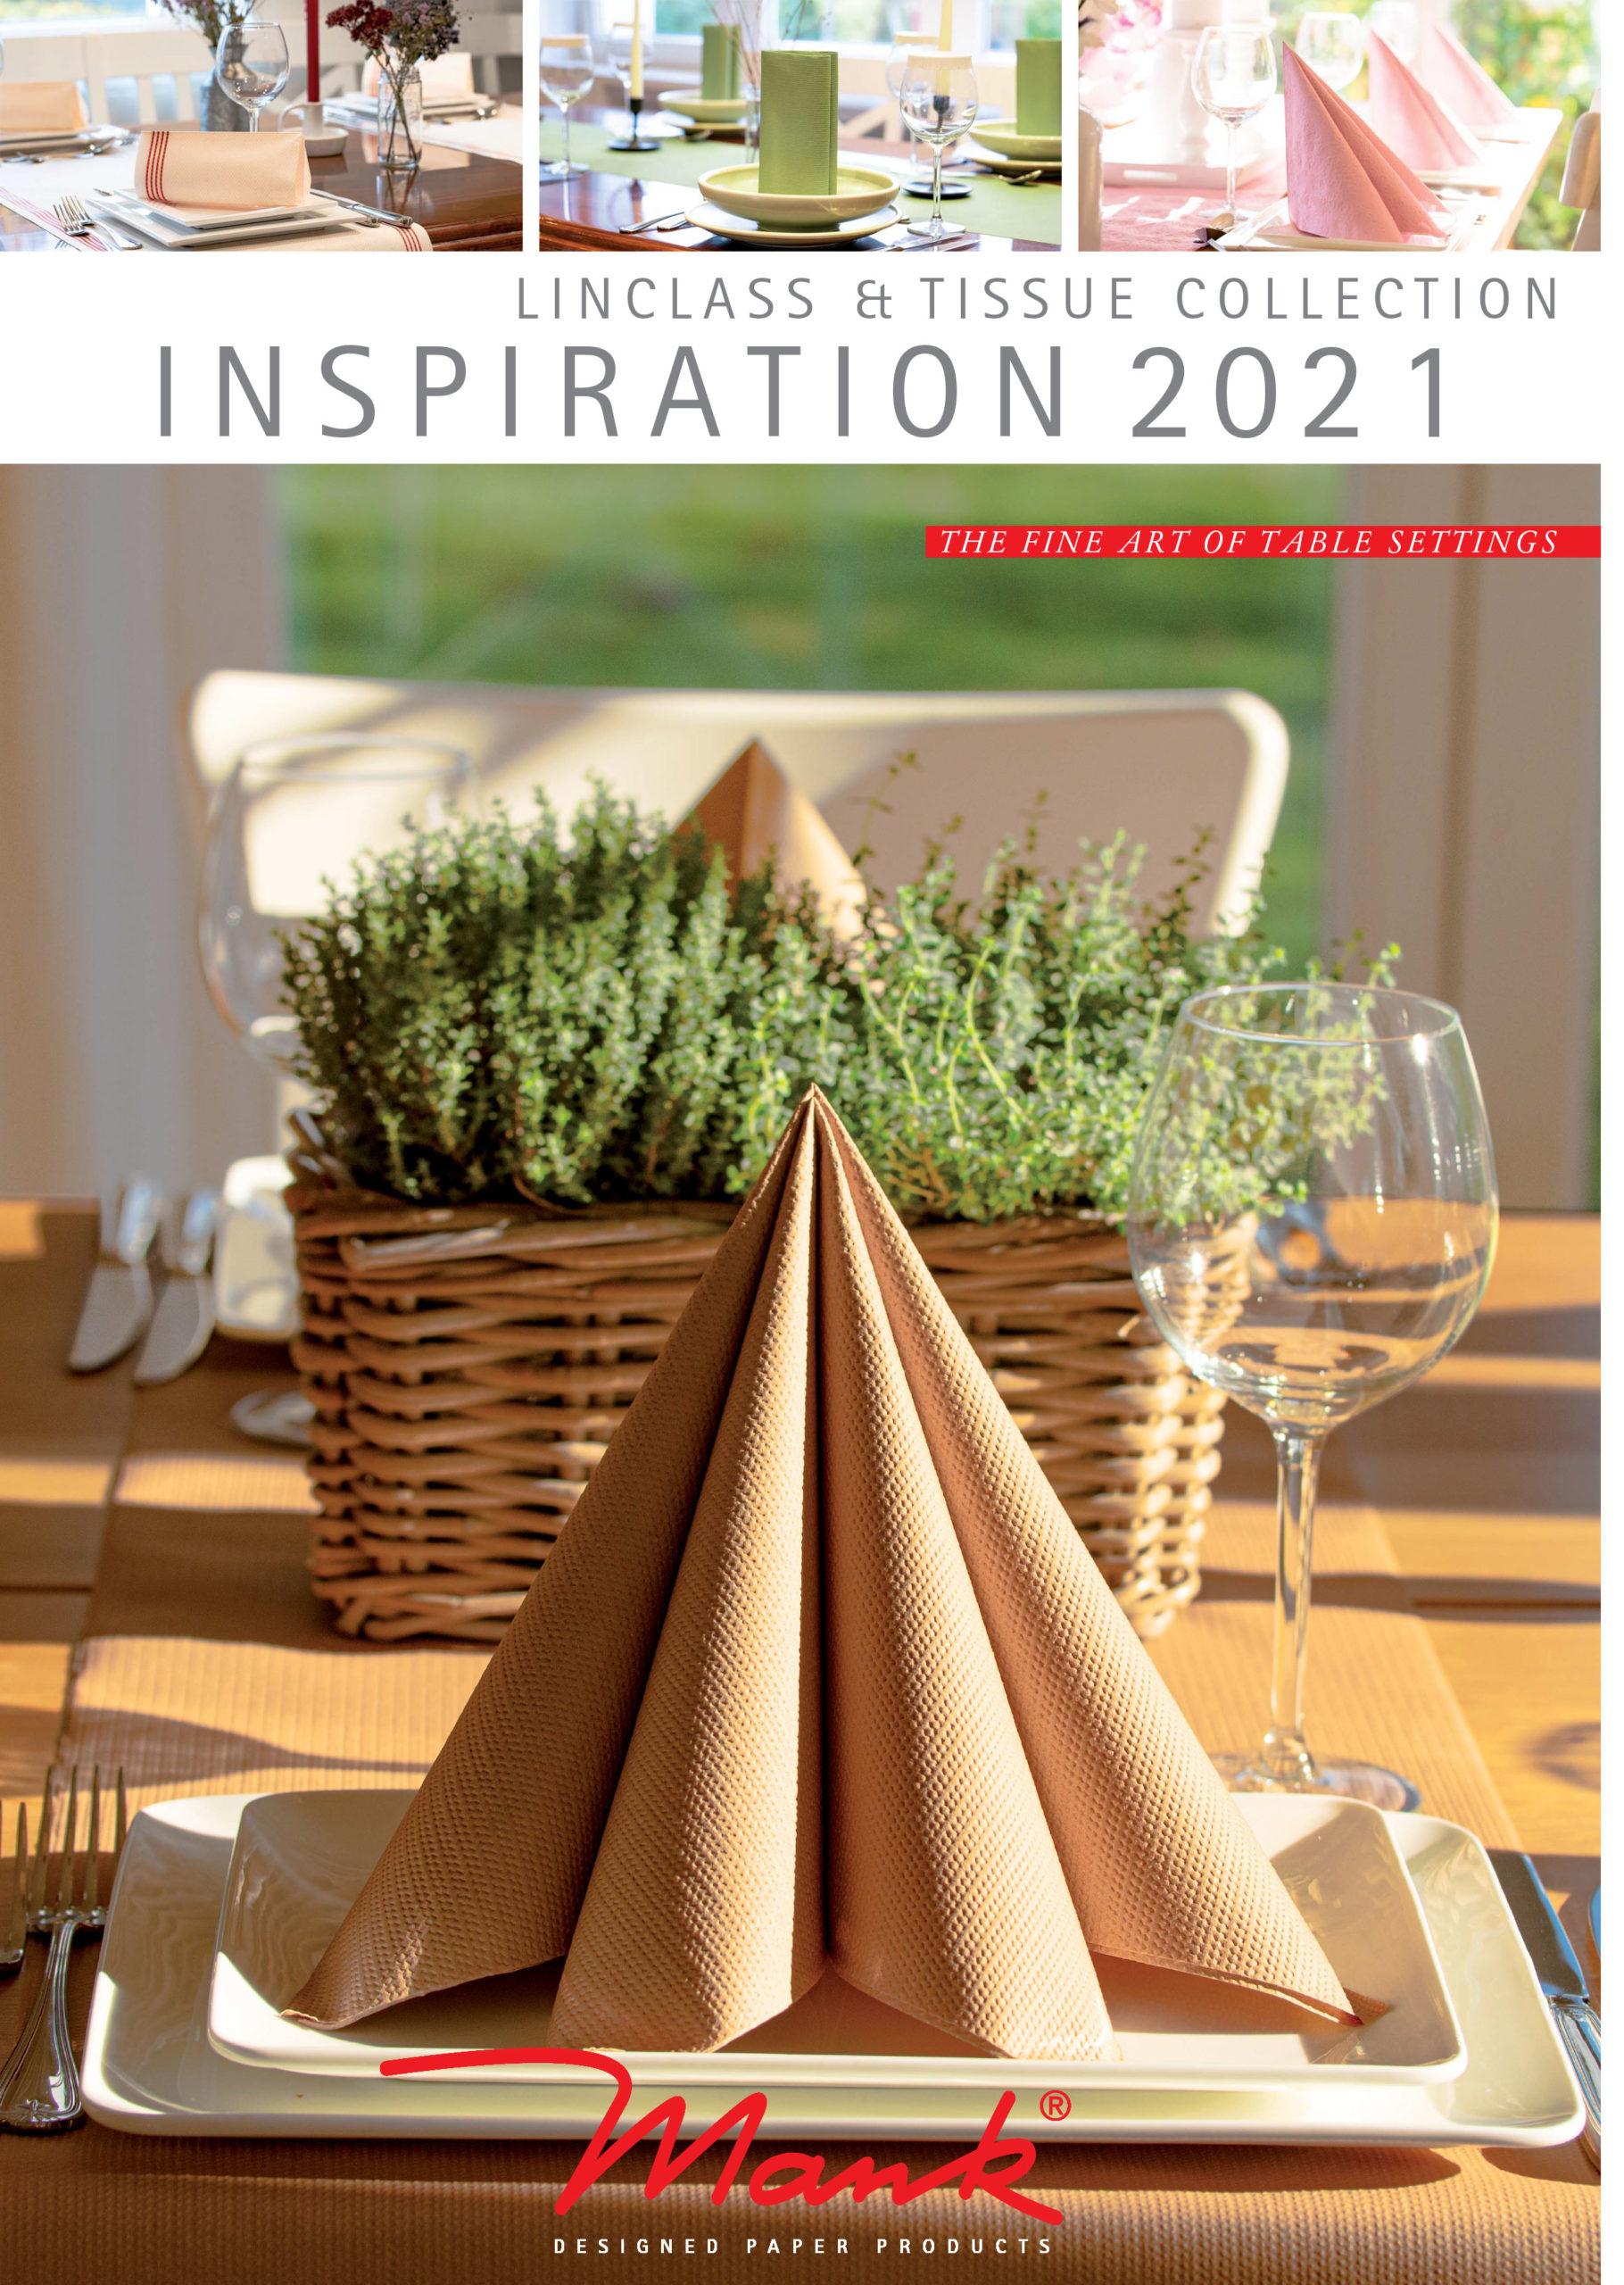 Inspiration-2021-1